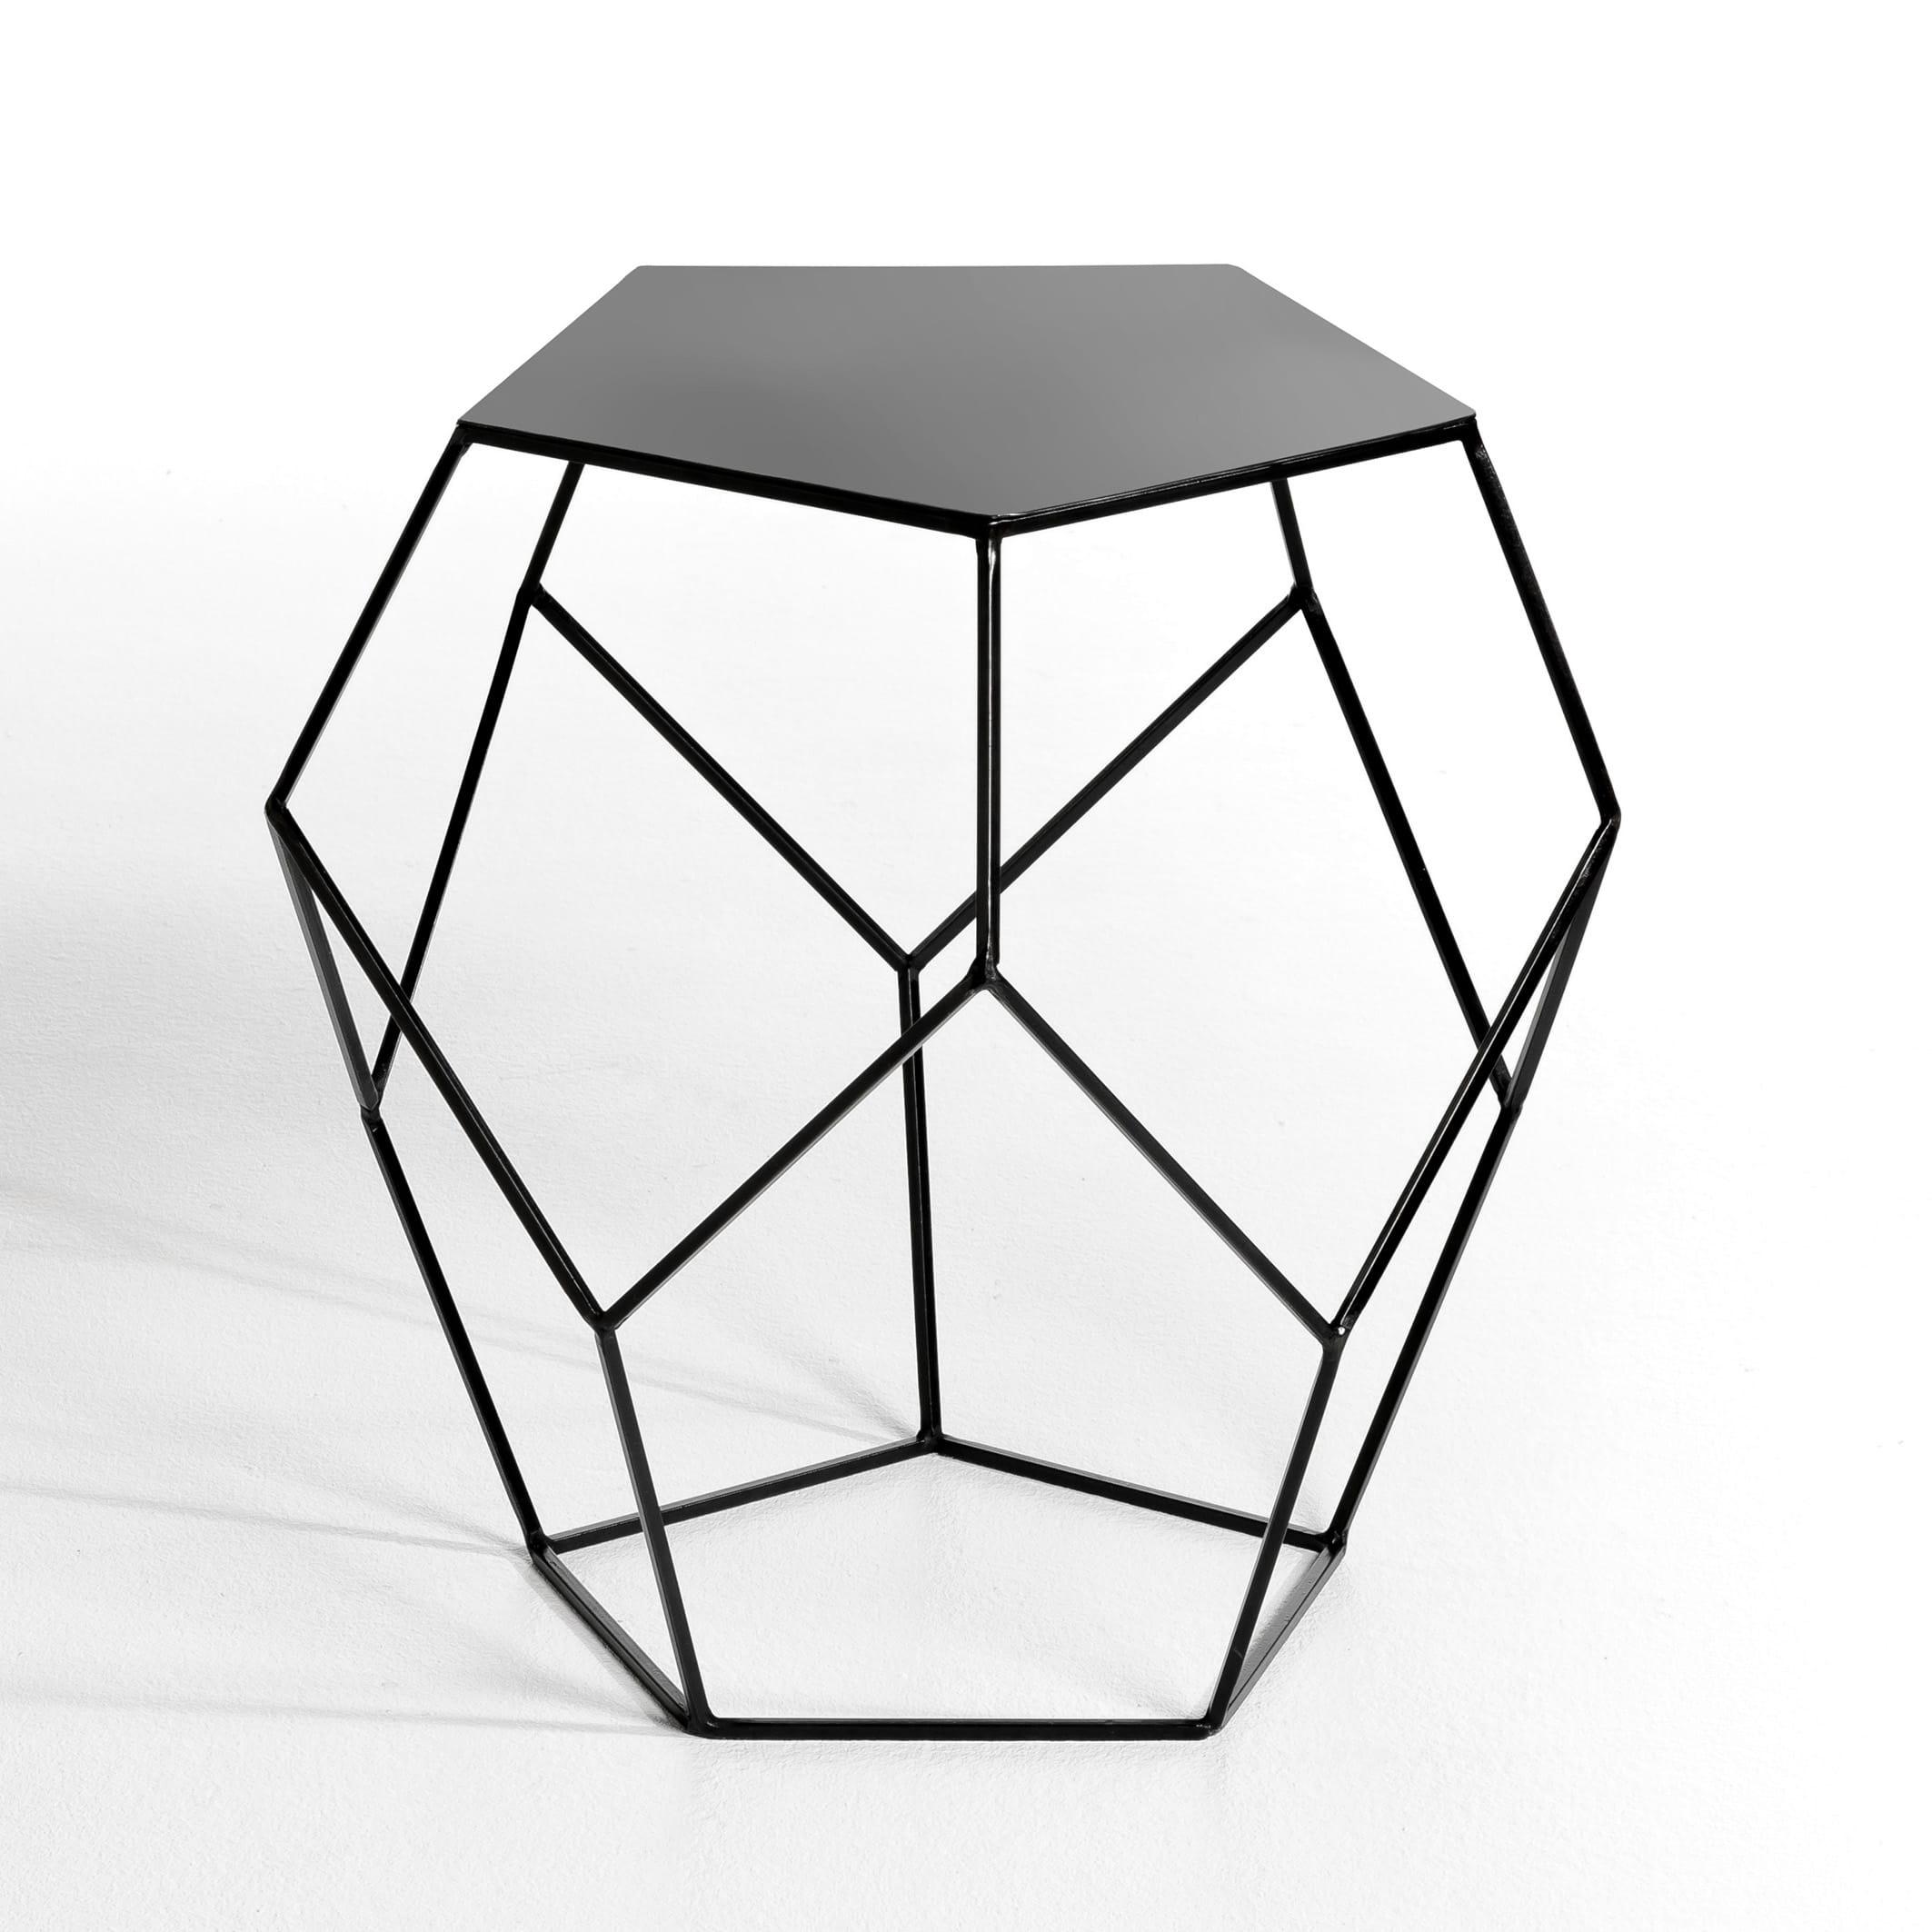 bout de canap am pm. Black Bedroom Furniture Sets. Home Design Ideas